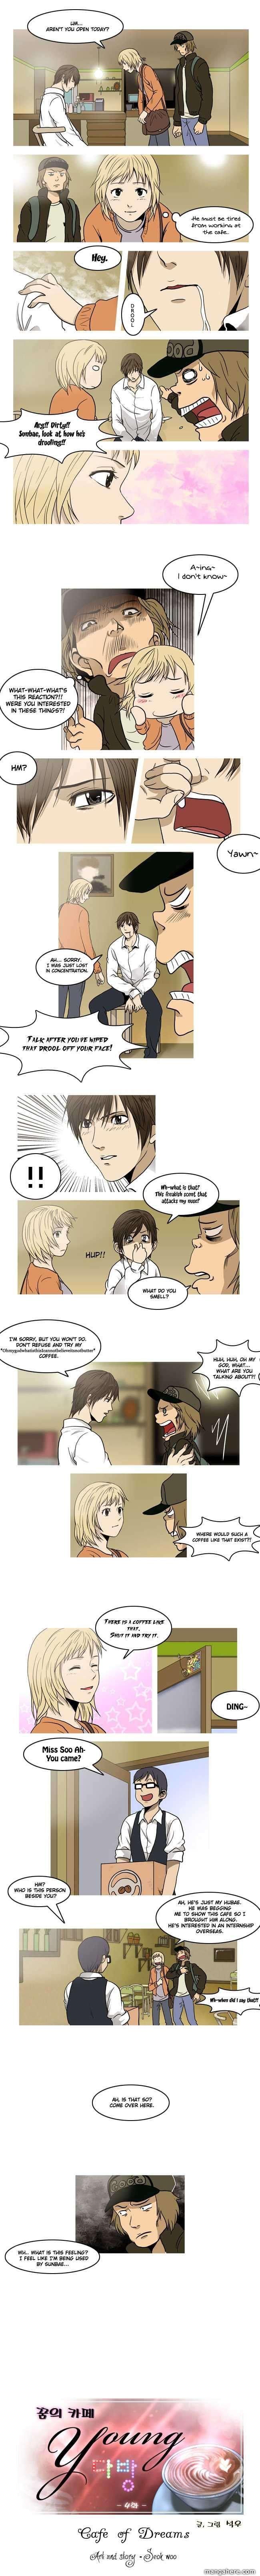 Cafe Of Dreams 4 Page 1